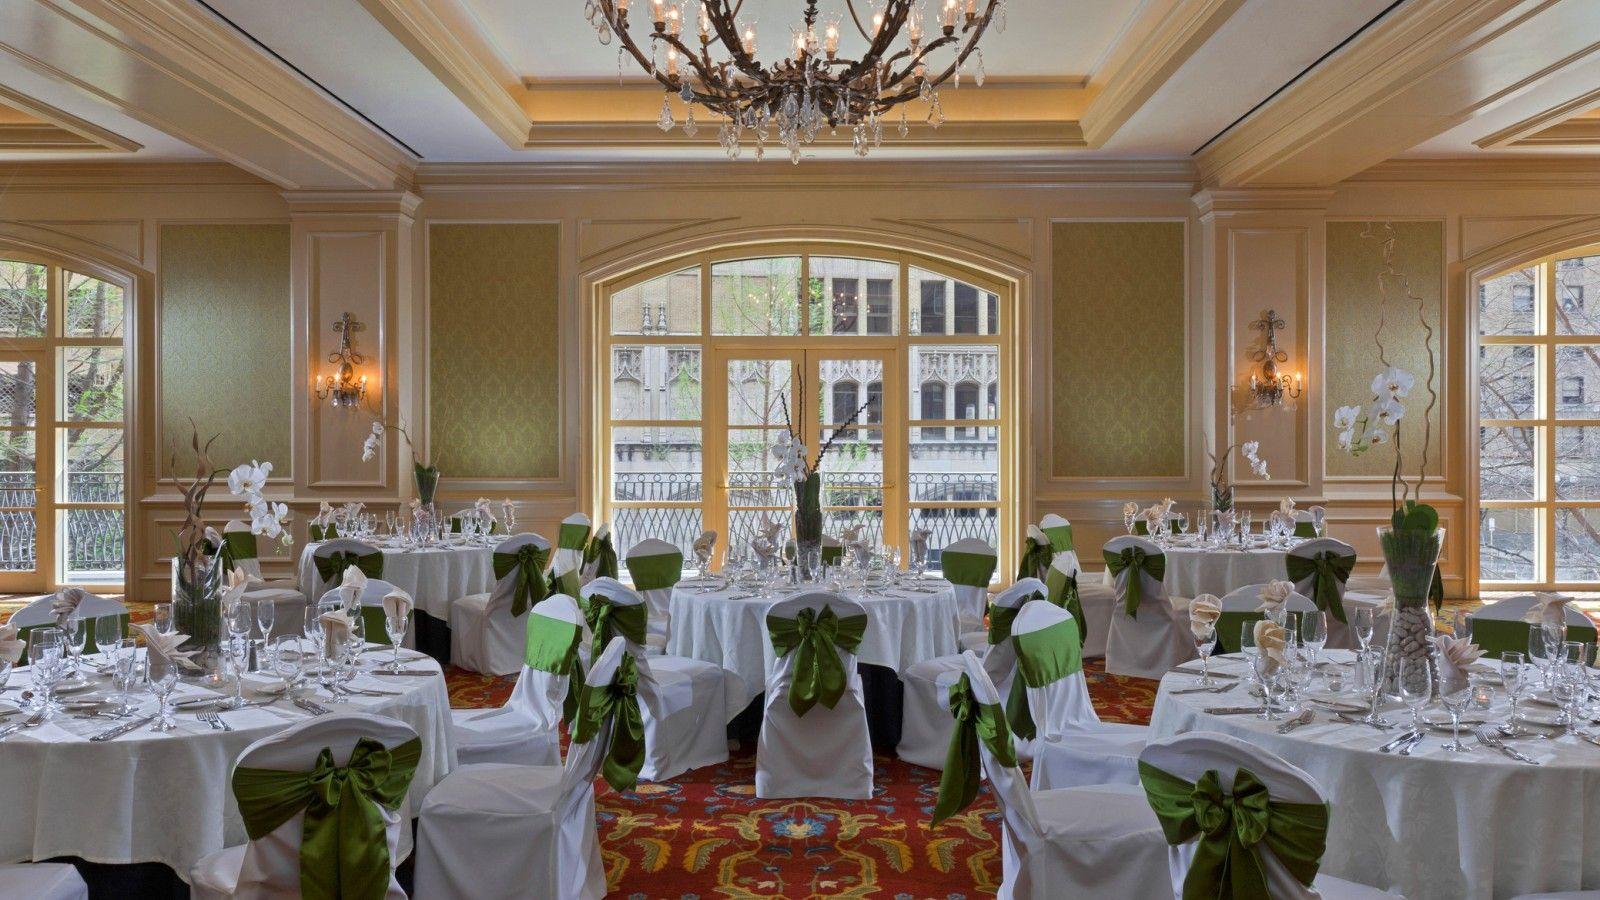 The Westin Riverwalk Hotel San Antonio Hidalgo Ballroom